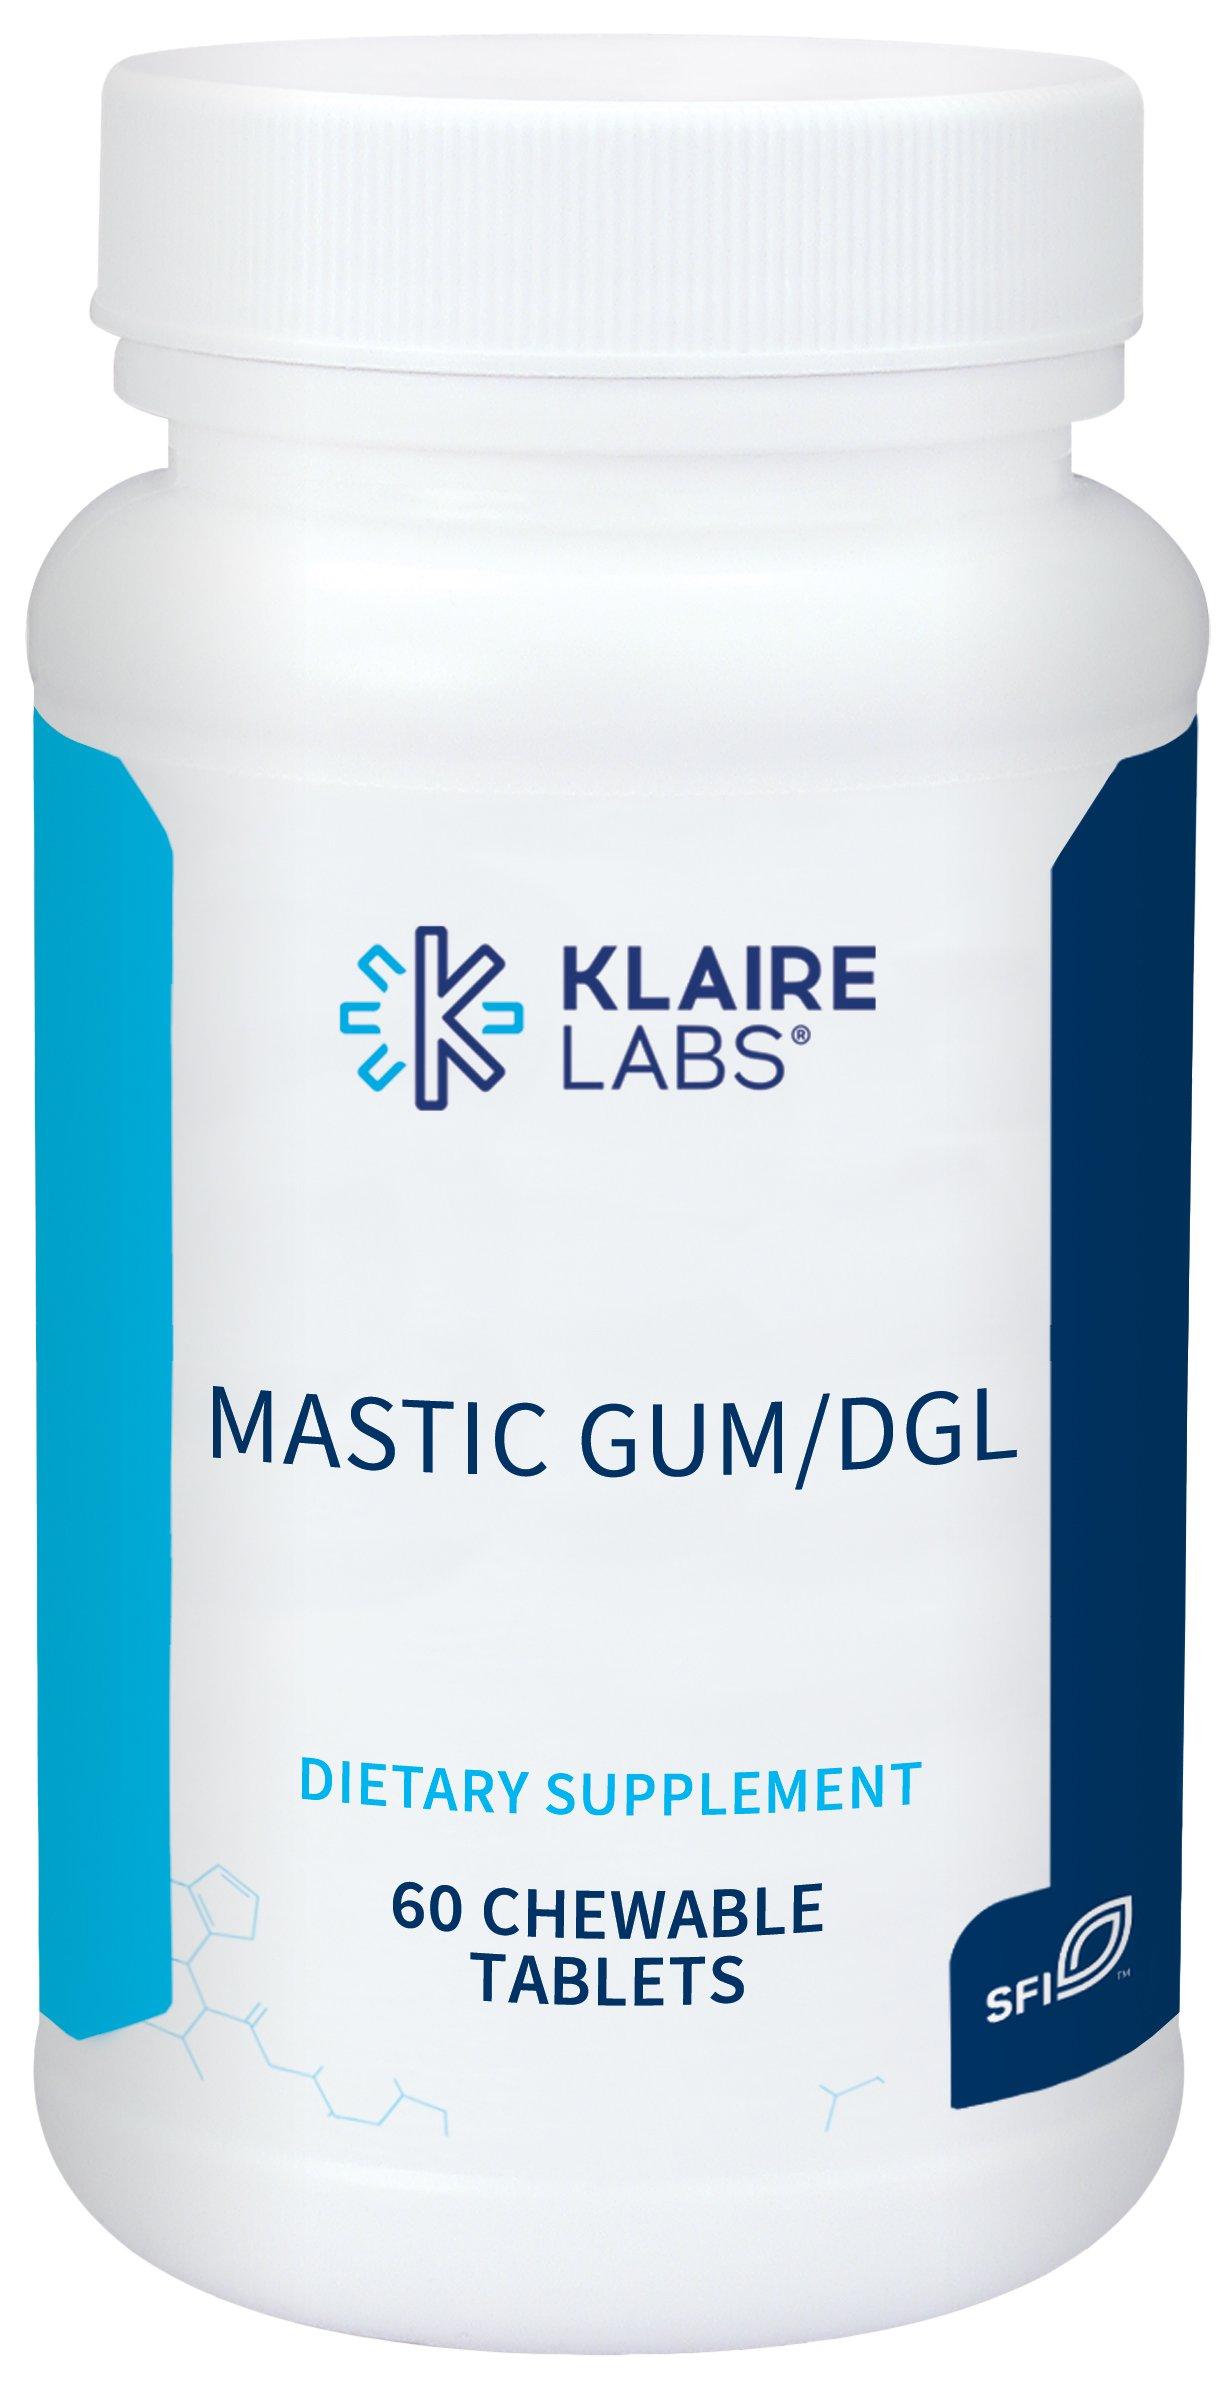 Klaire Labs Mastic Gum/DGL - Deglycyrrhizinated Licorice and Mastic Gum (60 Chewable Tablets)